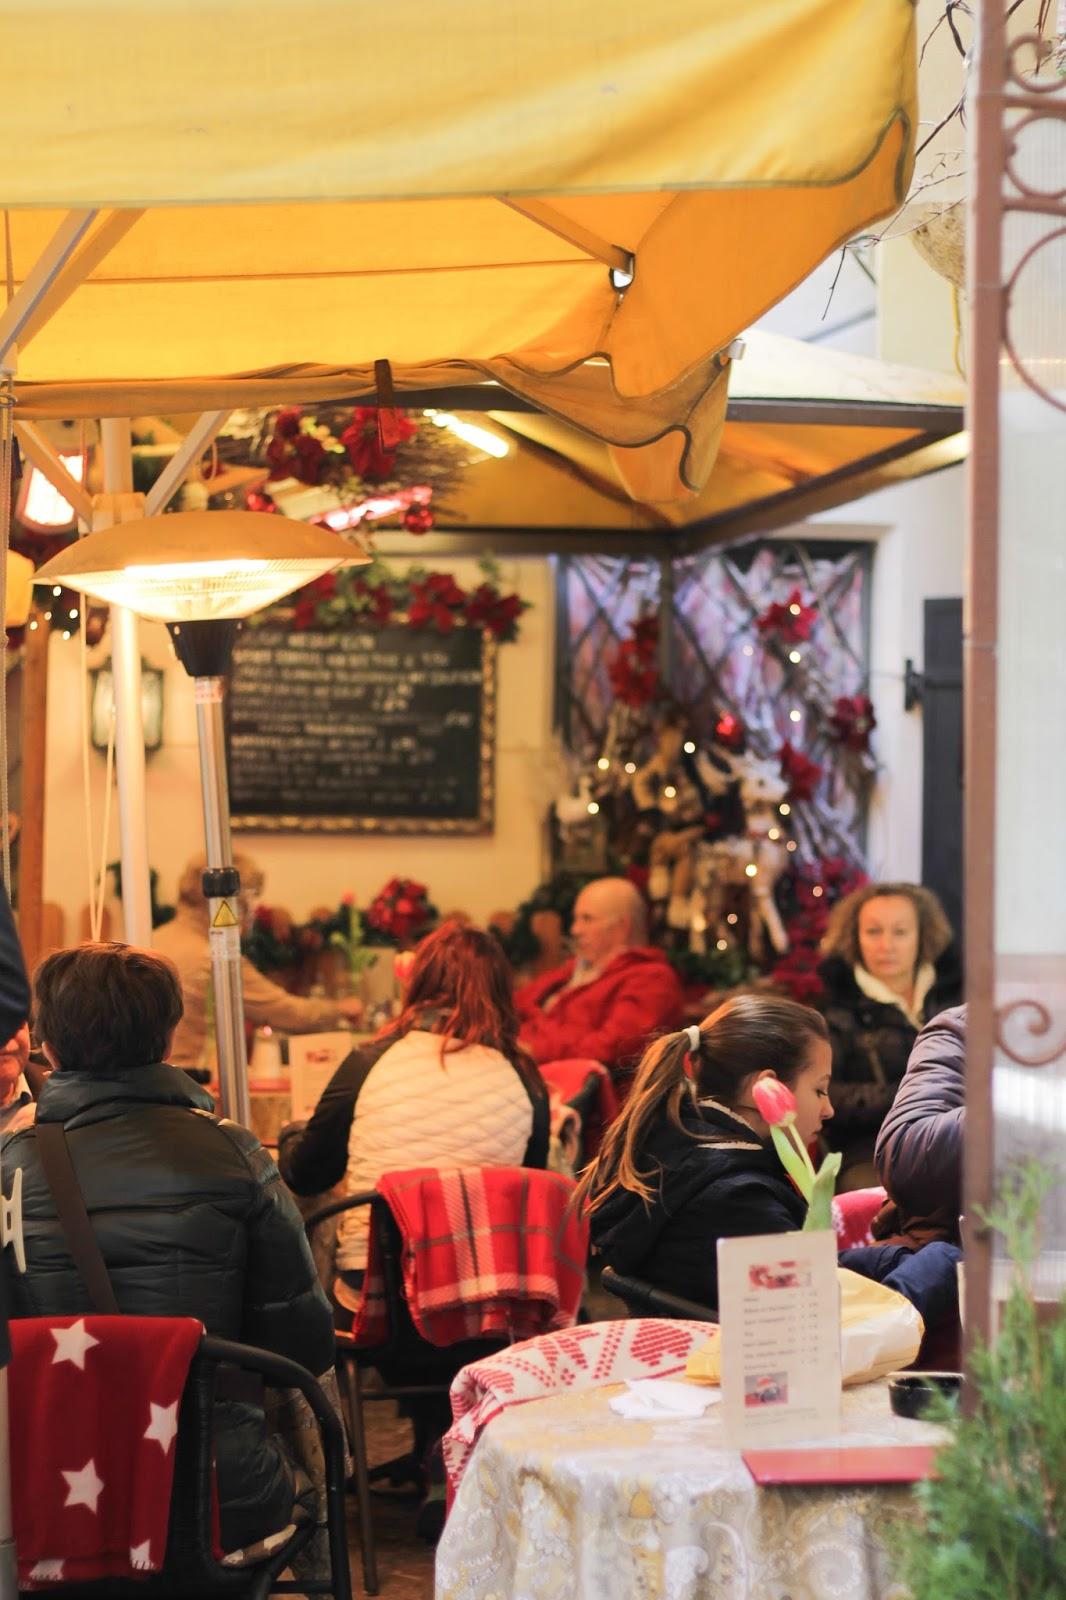 Cafe in Salzburg